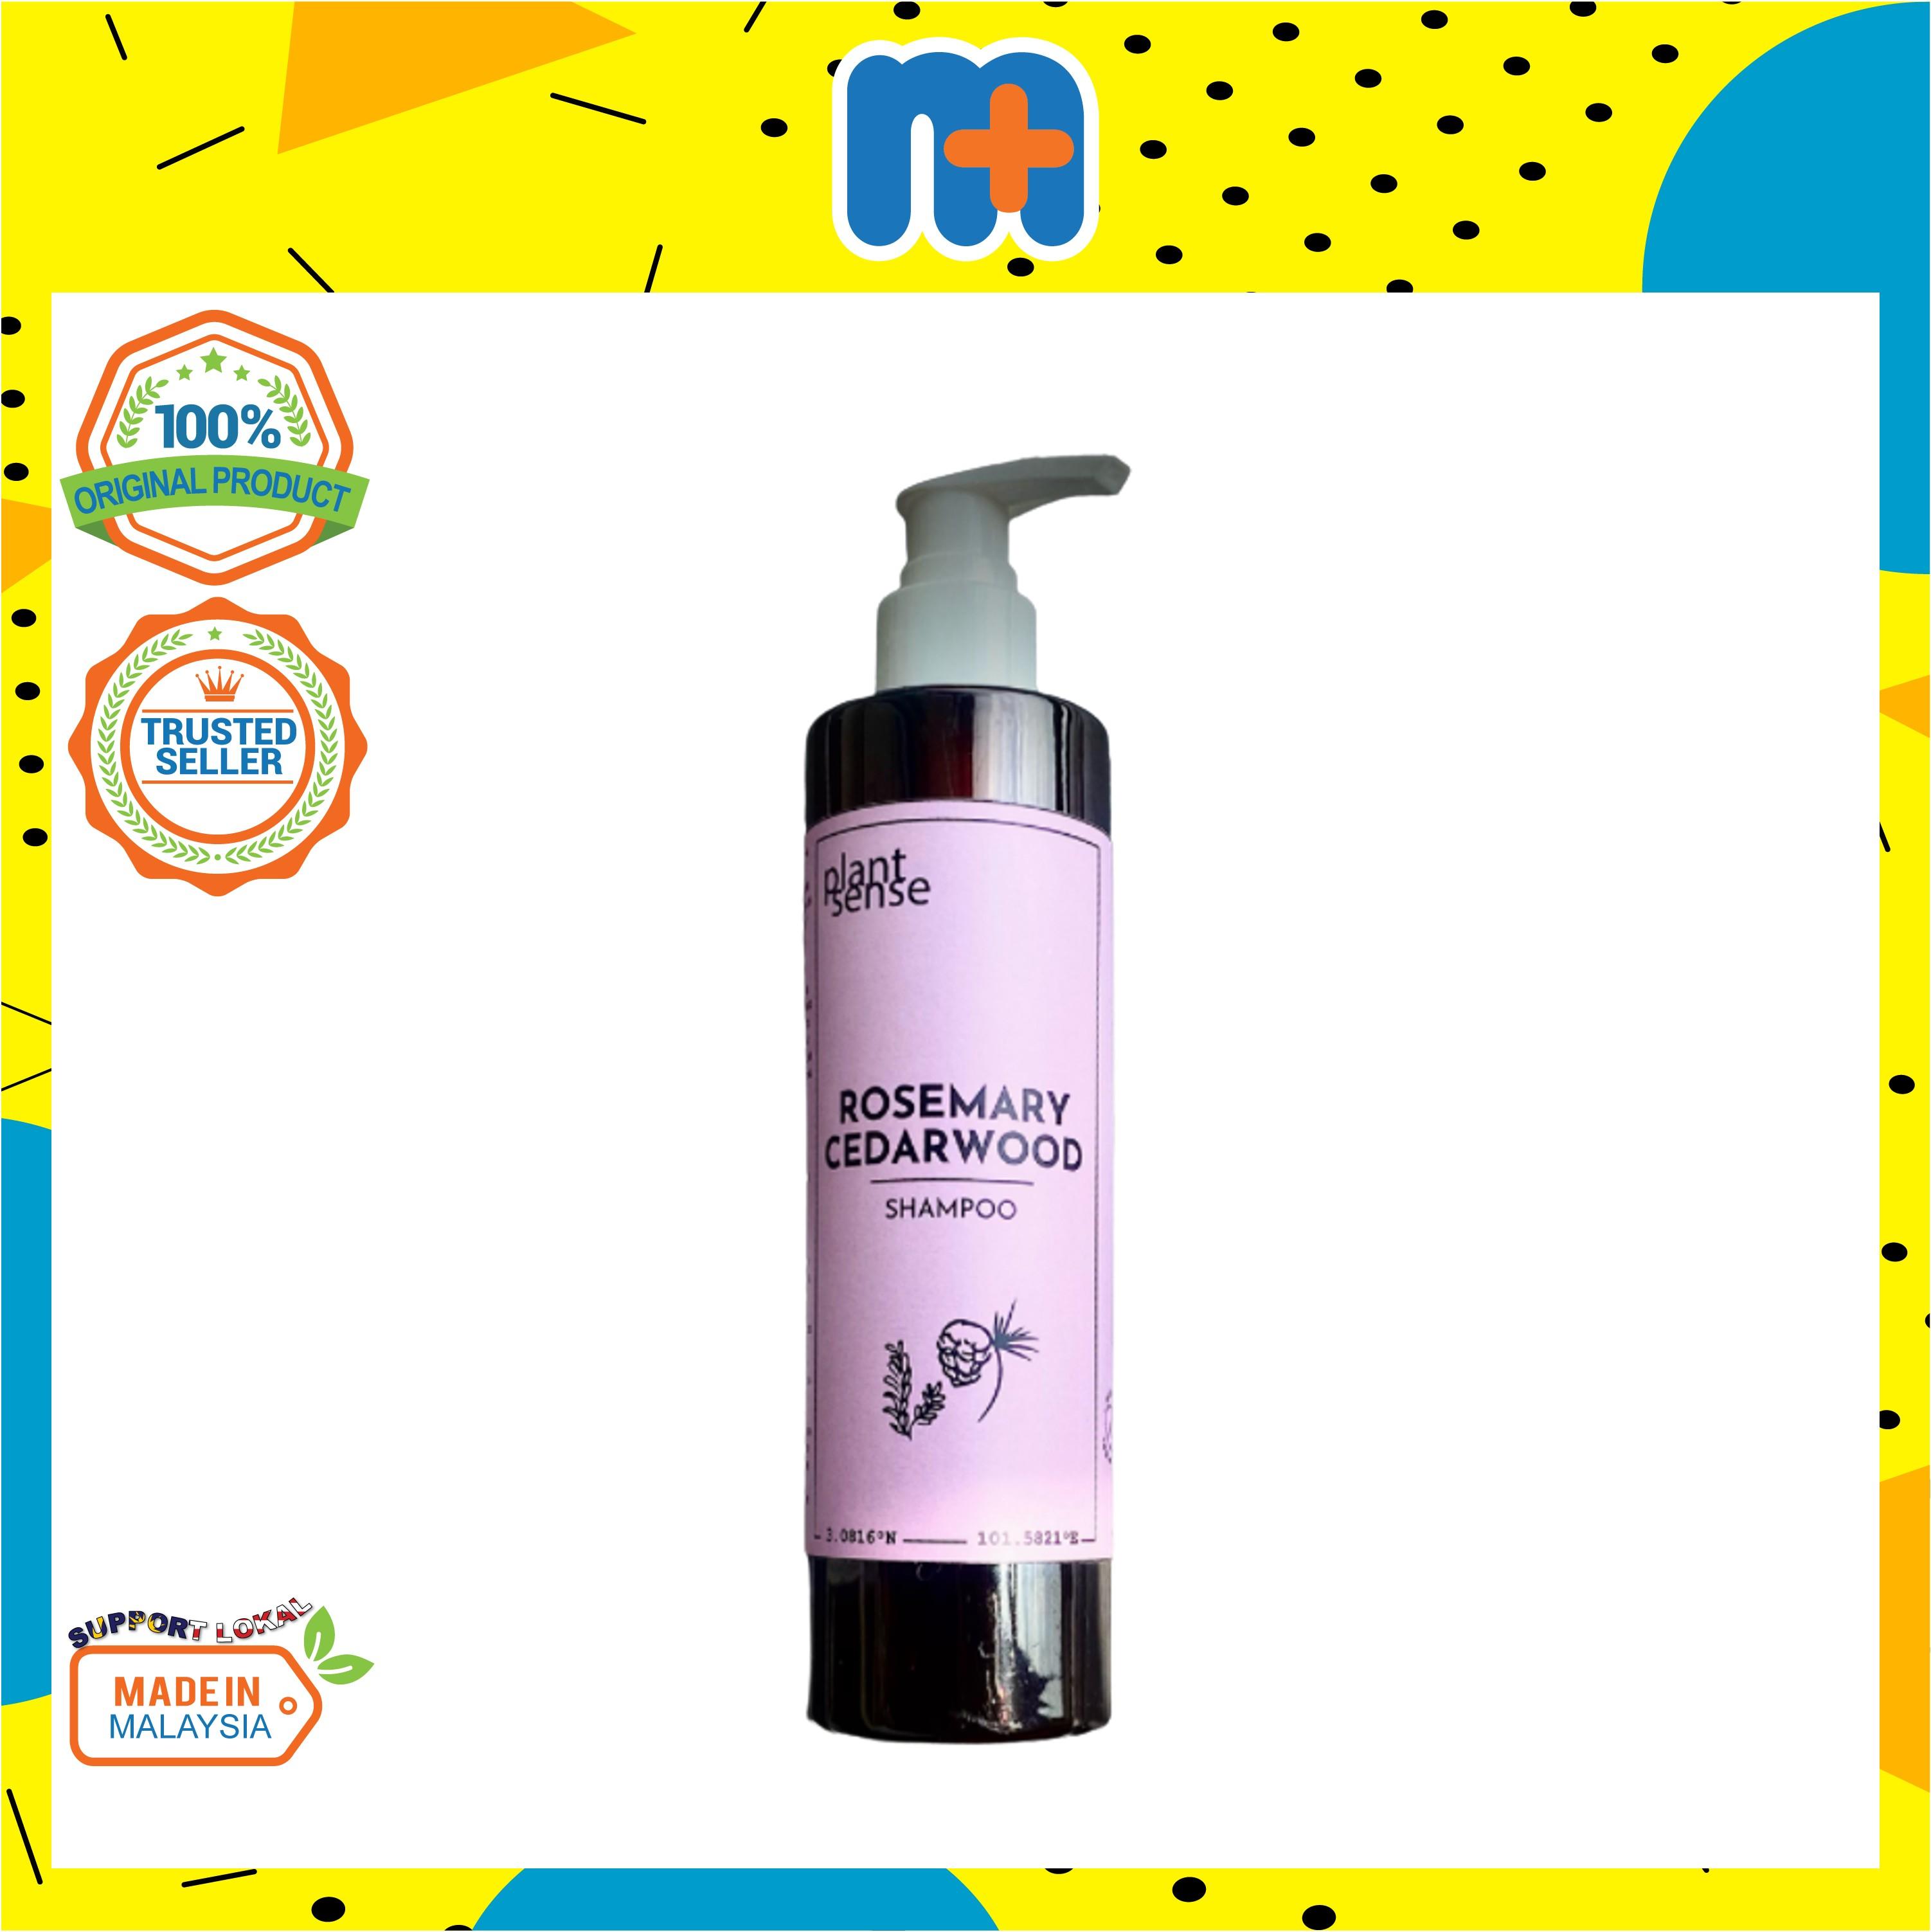 [MPLUS] PLANTSENSE Rosemary Cedarwood Hair Shampoo 300ml